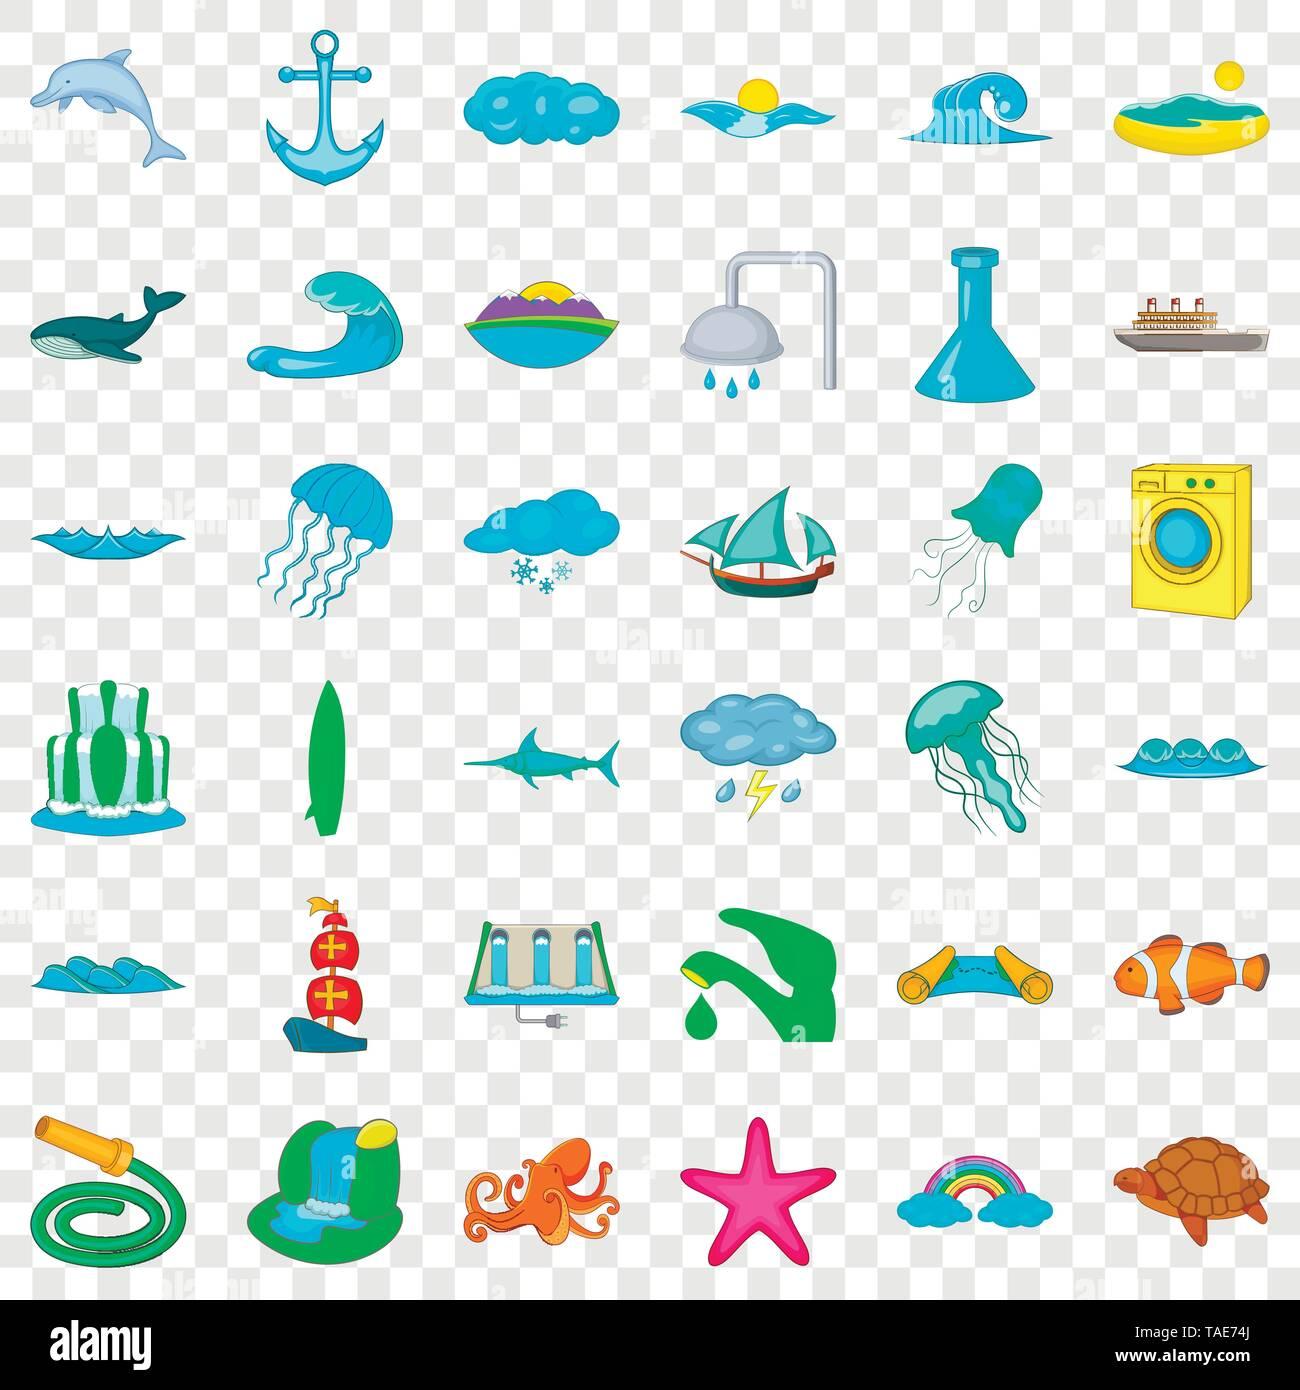 Sea icons set, cartoon style - Stock Image